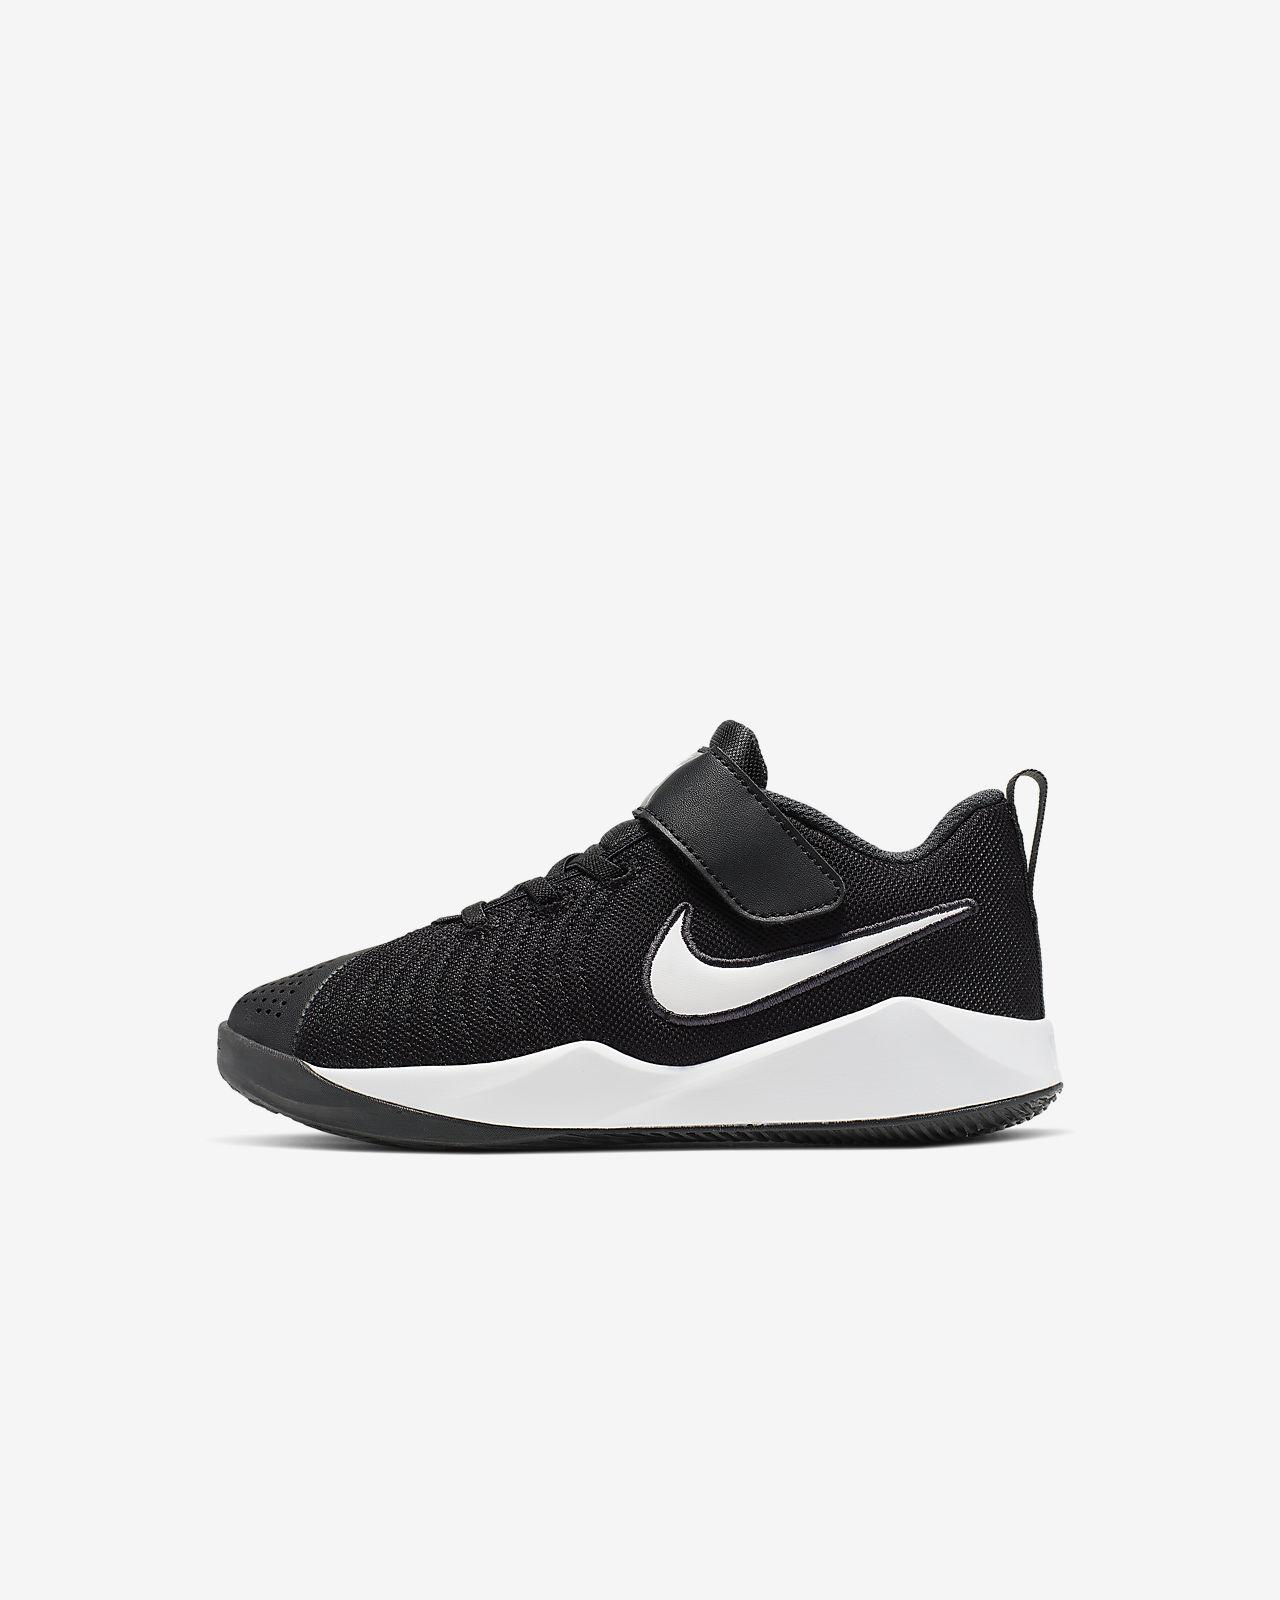 Quick Schuh Nike Kinder 2 für Team jüngere Hustle EDI9eWb2YH